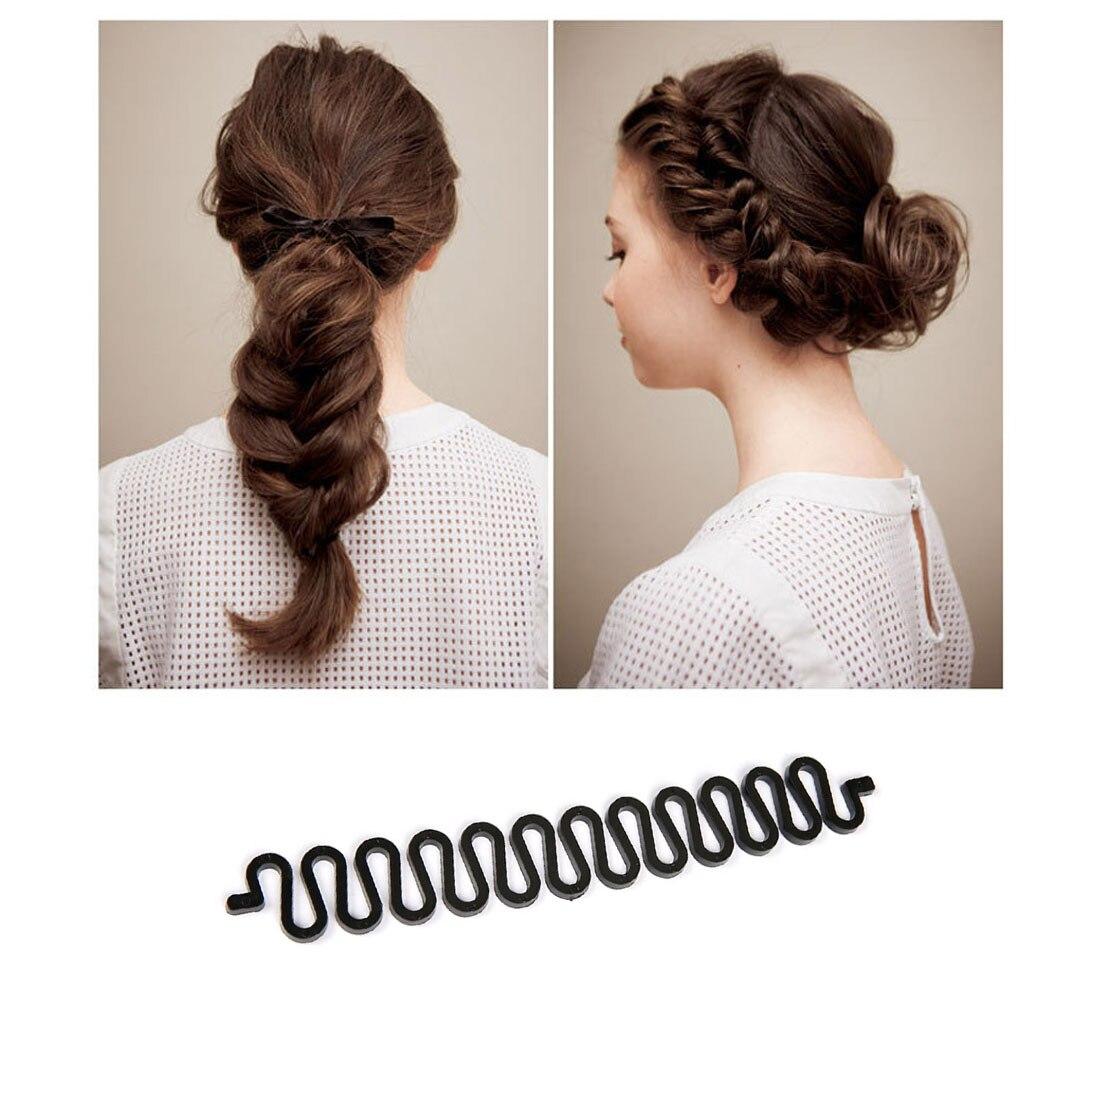 French Braiding Tools Magic Hair Clip Braider Stylist Queue Twist Plait Hair Braid DIY Hairstyle Styling Accessories заколка french twist